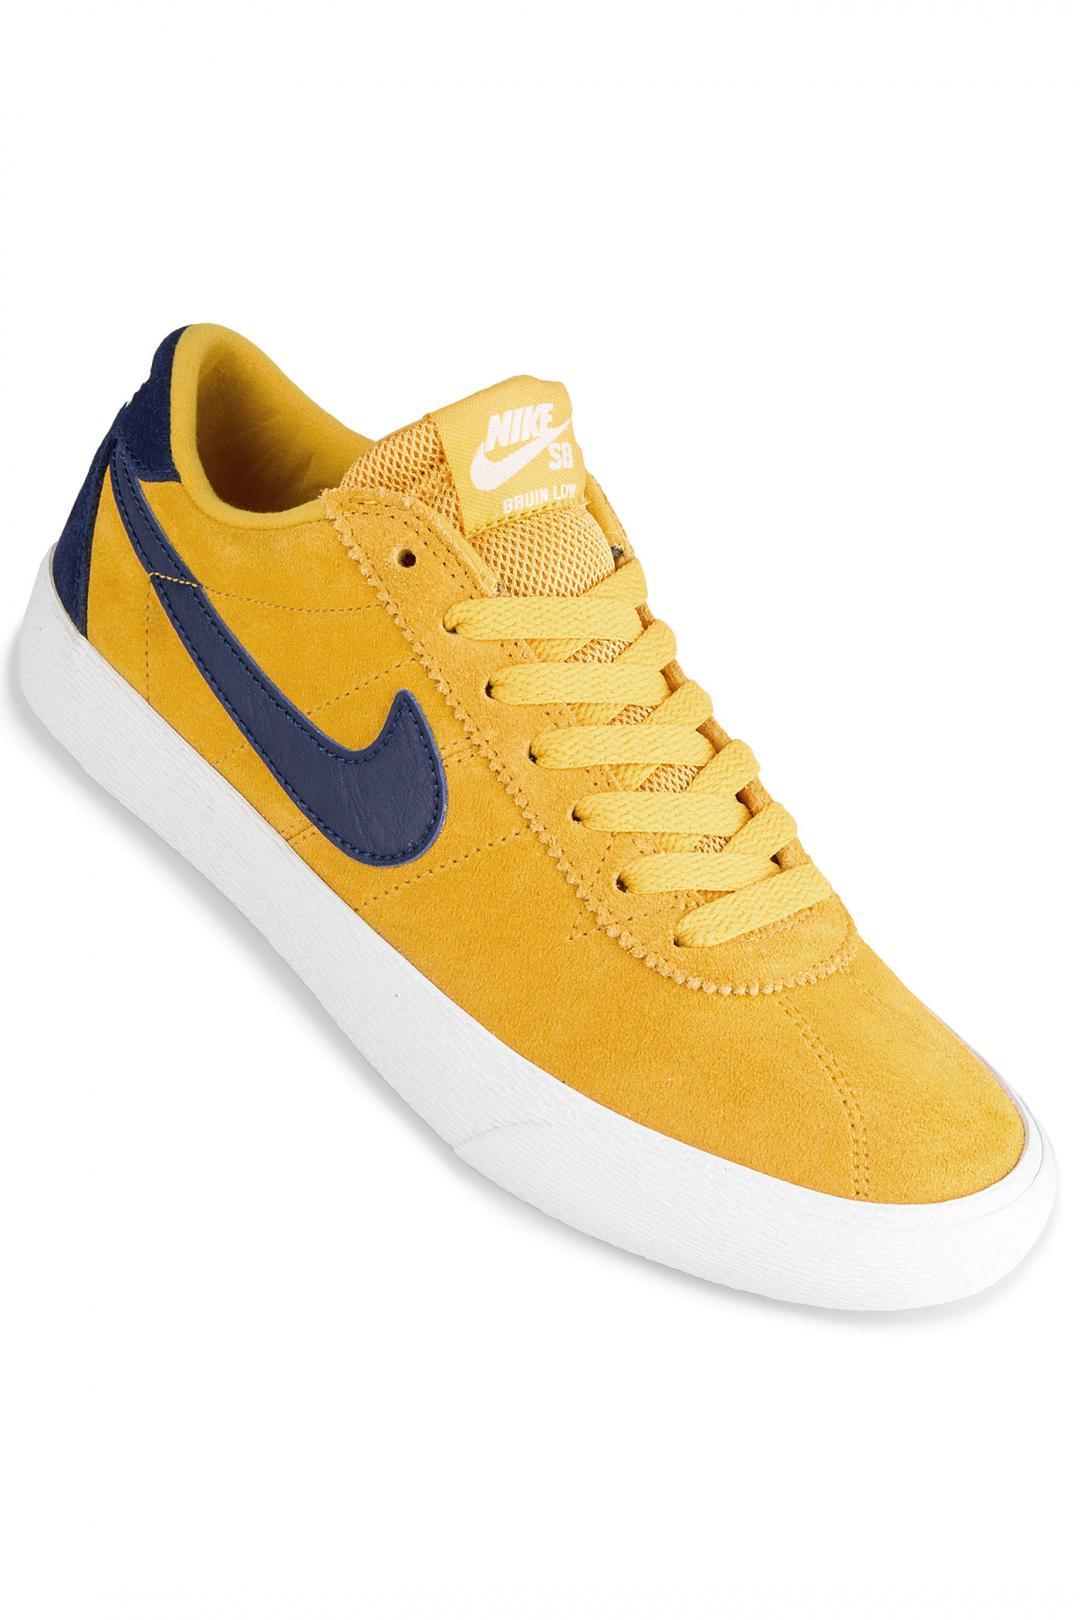 Donna Nike SB Bruin Lo yellow ochre blue void   Sneaker